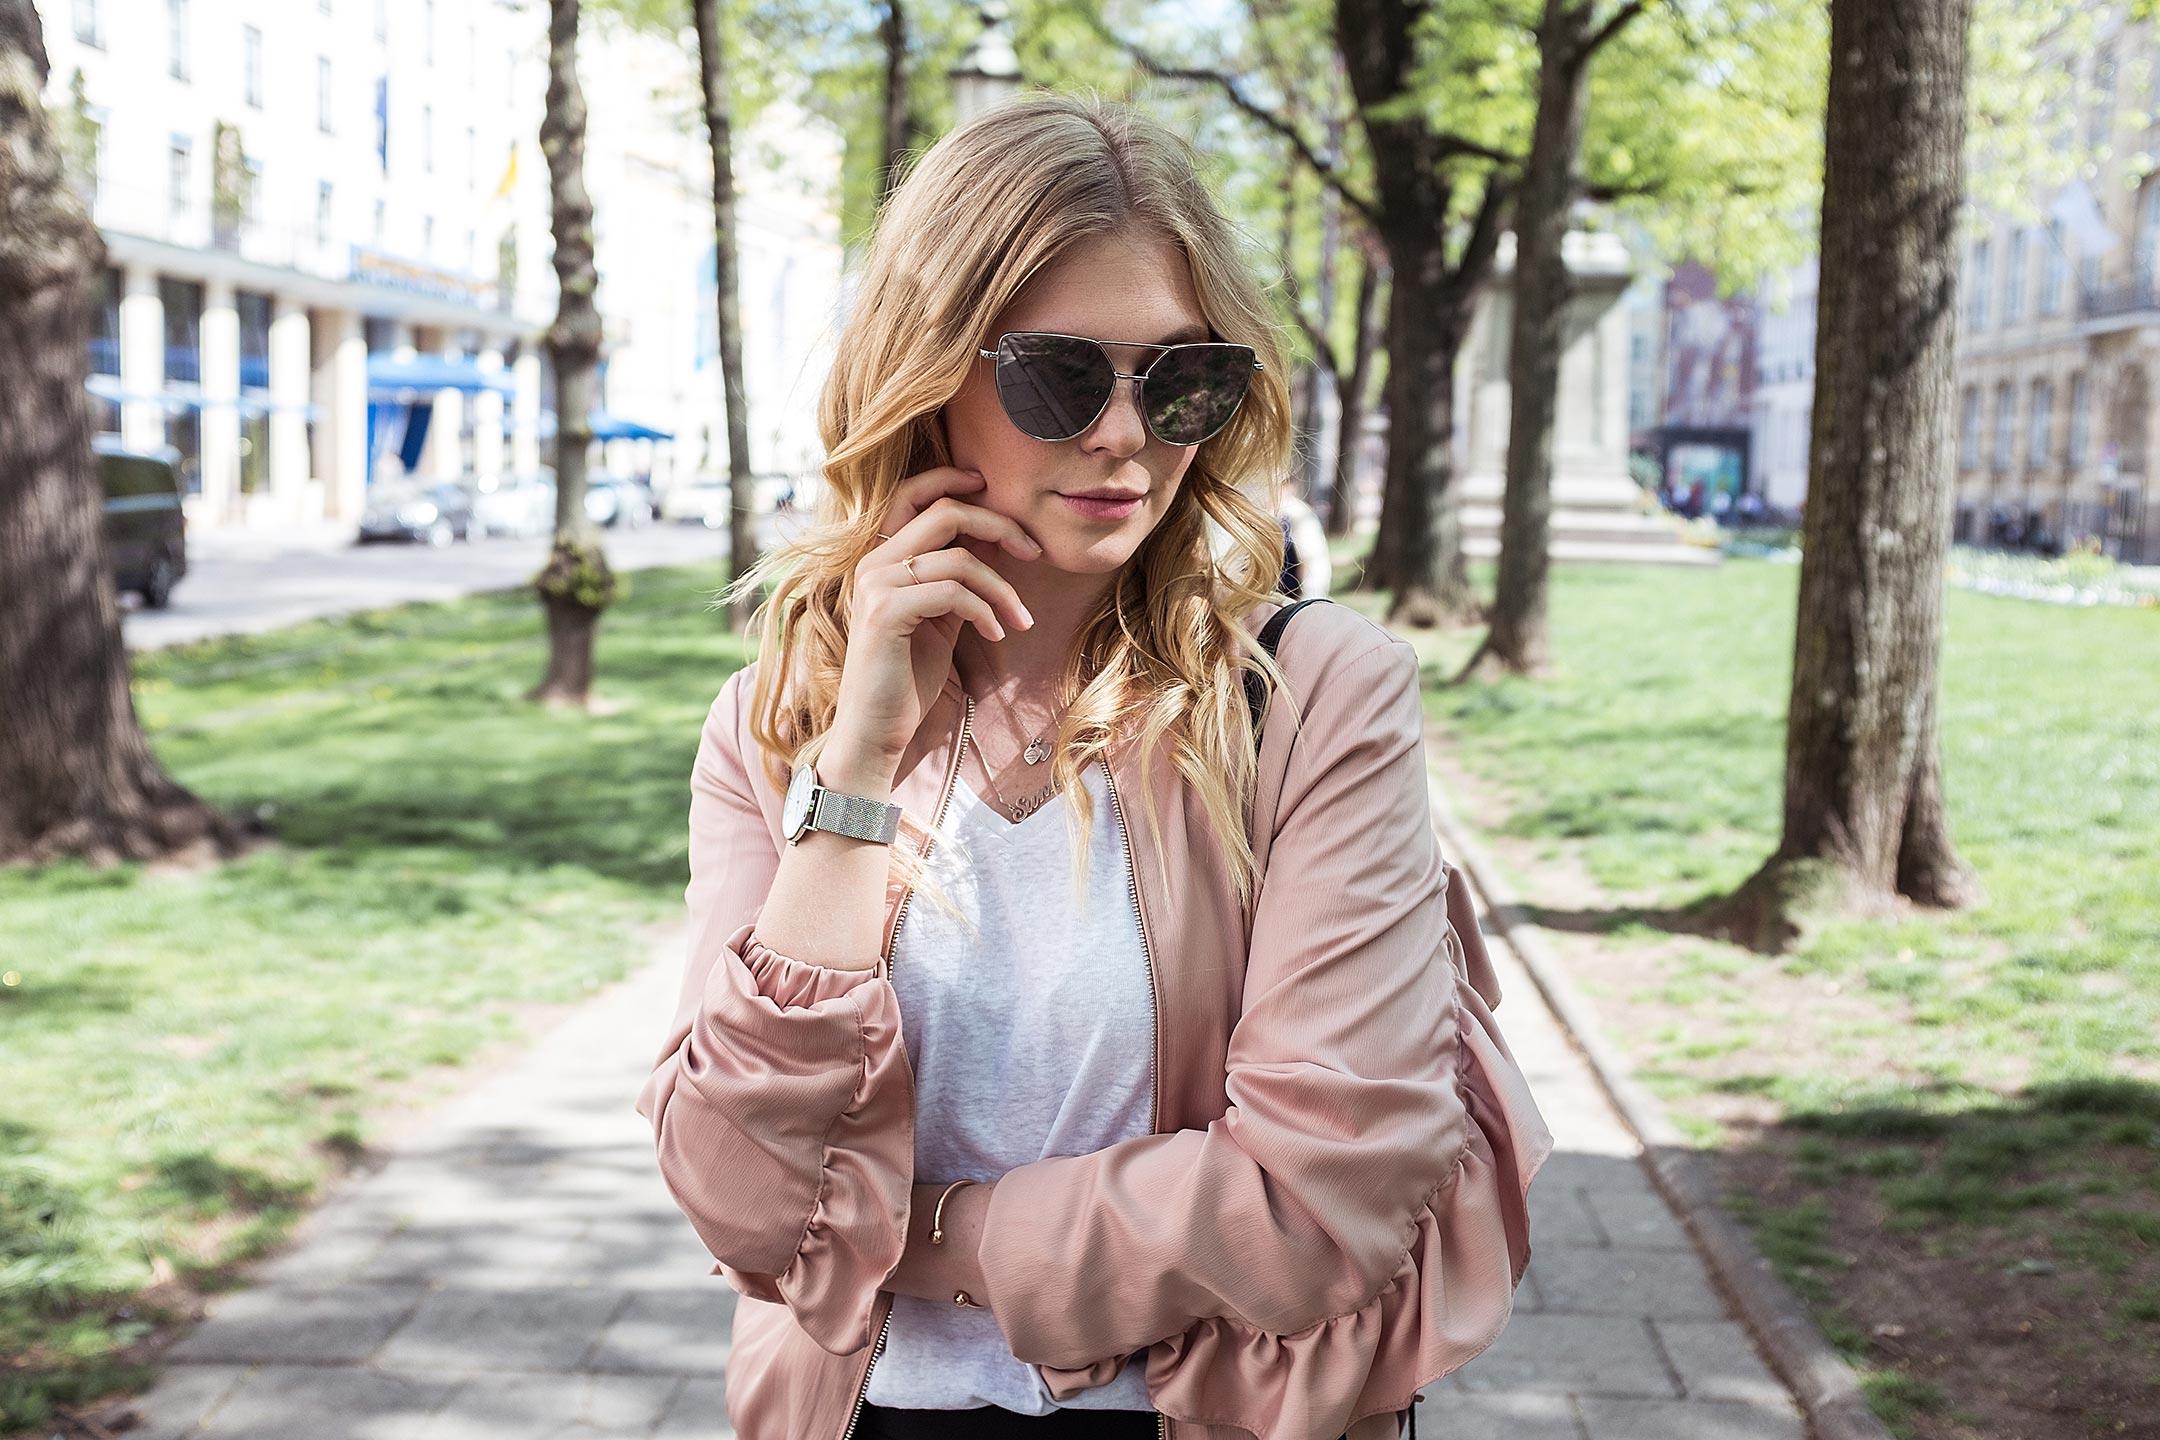 Rosa Blouson Outfit Sunnyinga Fashionblog